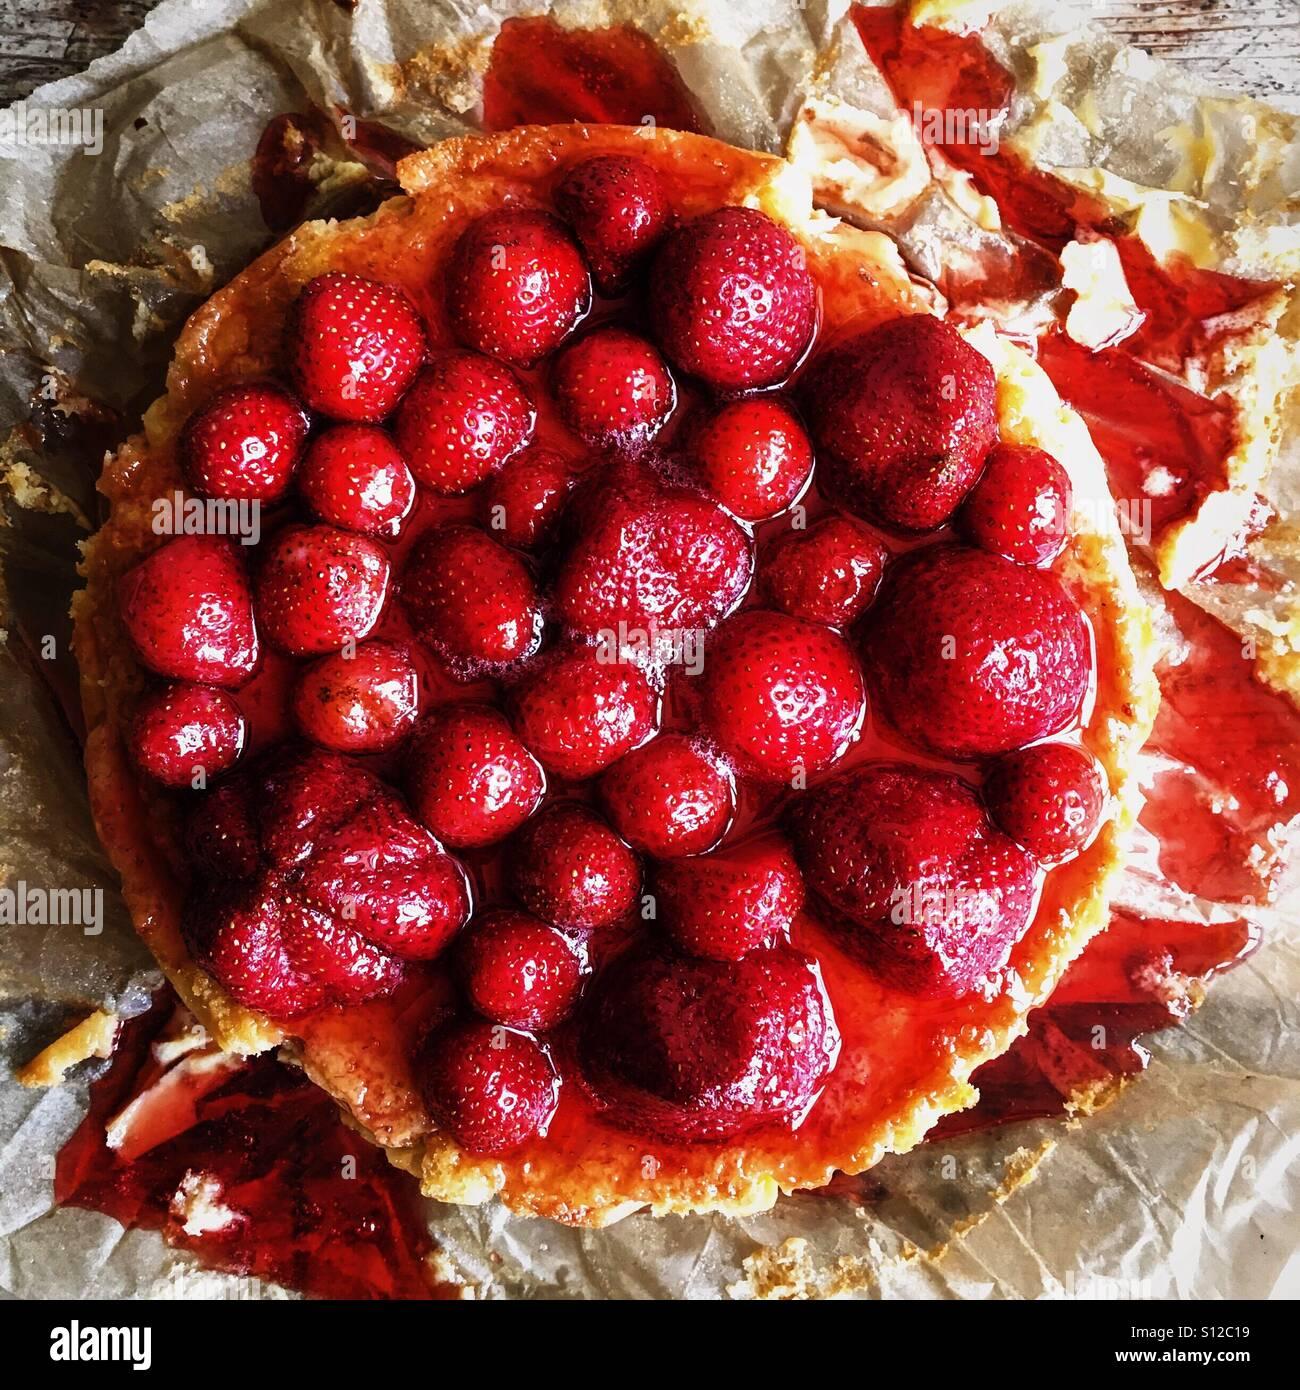 Strawberry Cheesecake - Stock Image